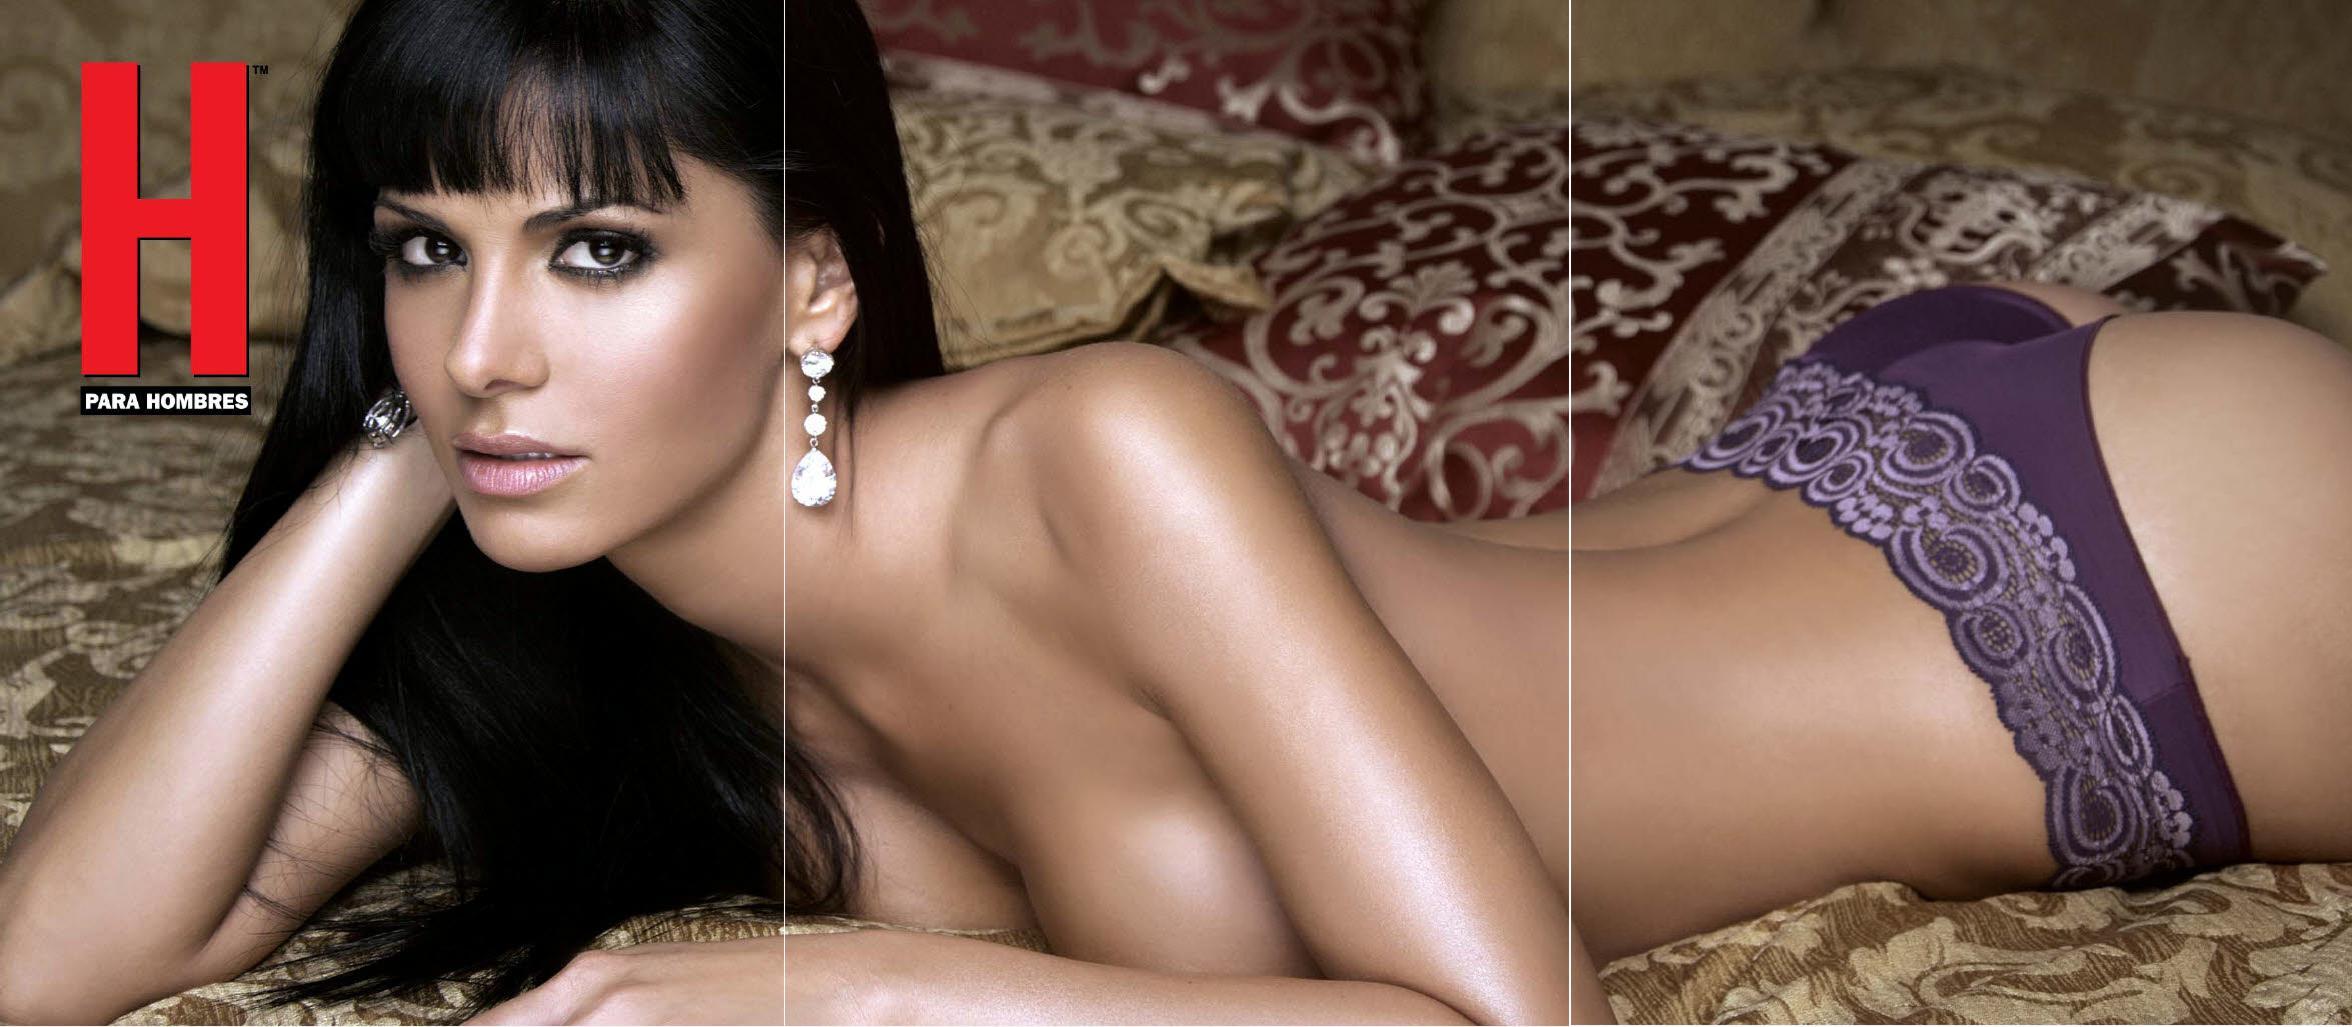 Vanessa Arias sexo